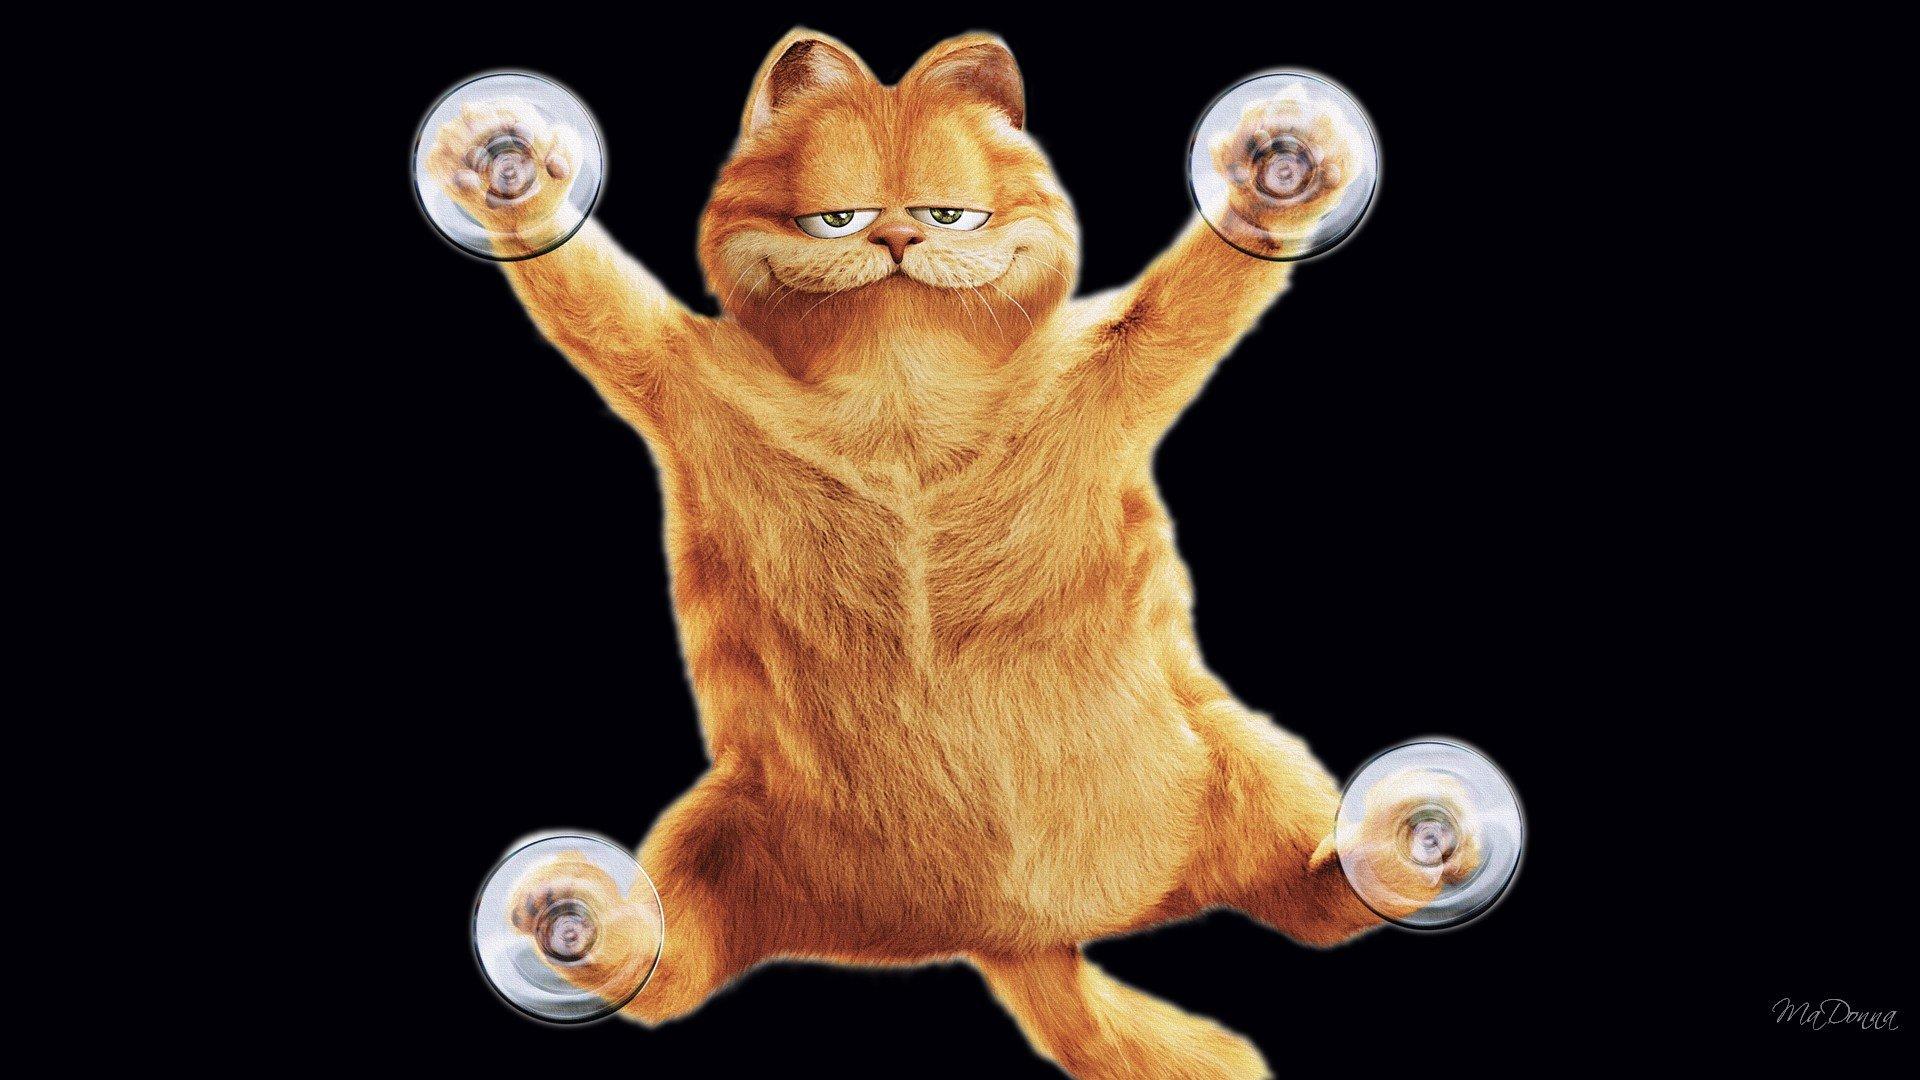 Garfield Wallpapers Hd For Desktop Backgrounds